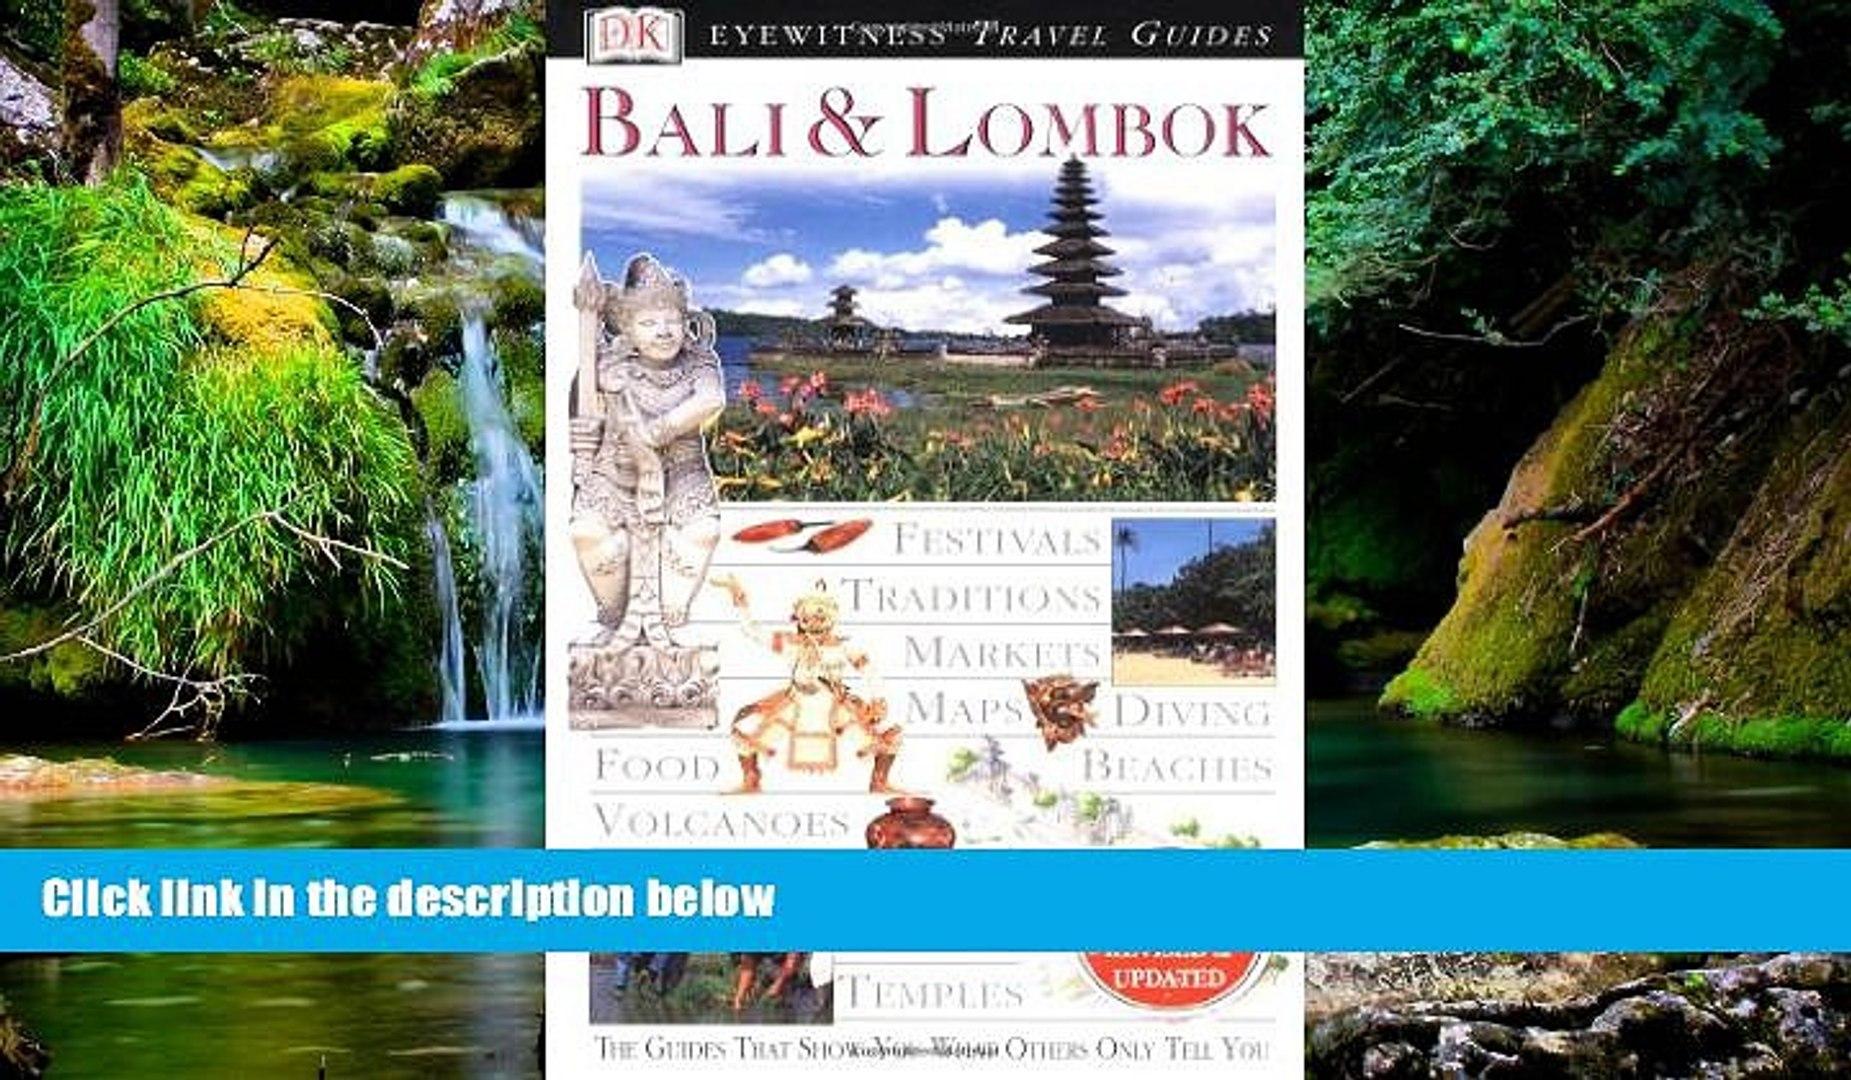 Must Have Eyewitness Travel Guide To Bali Lombok Read Ebook Full Ebook